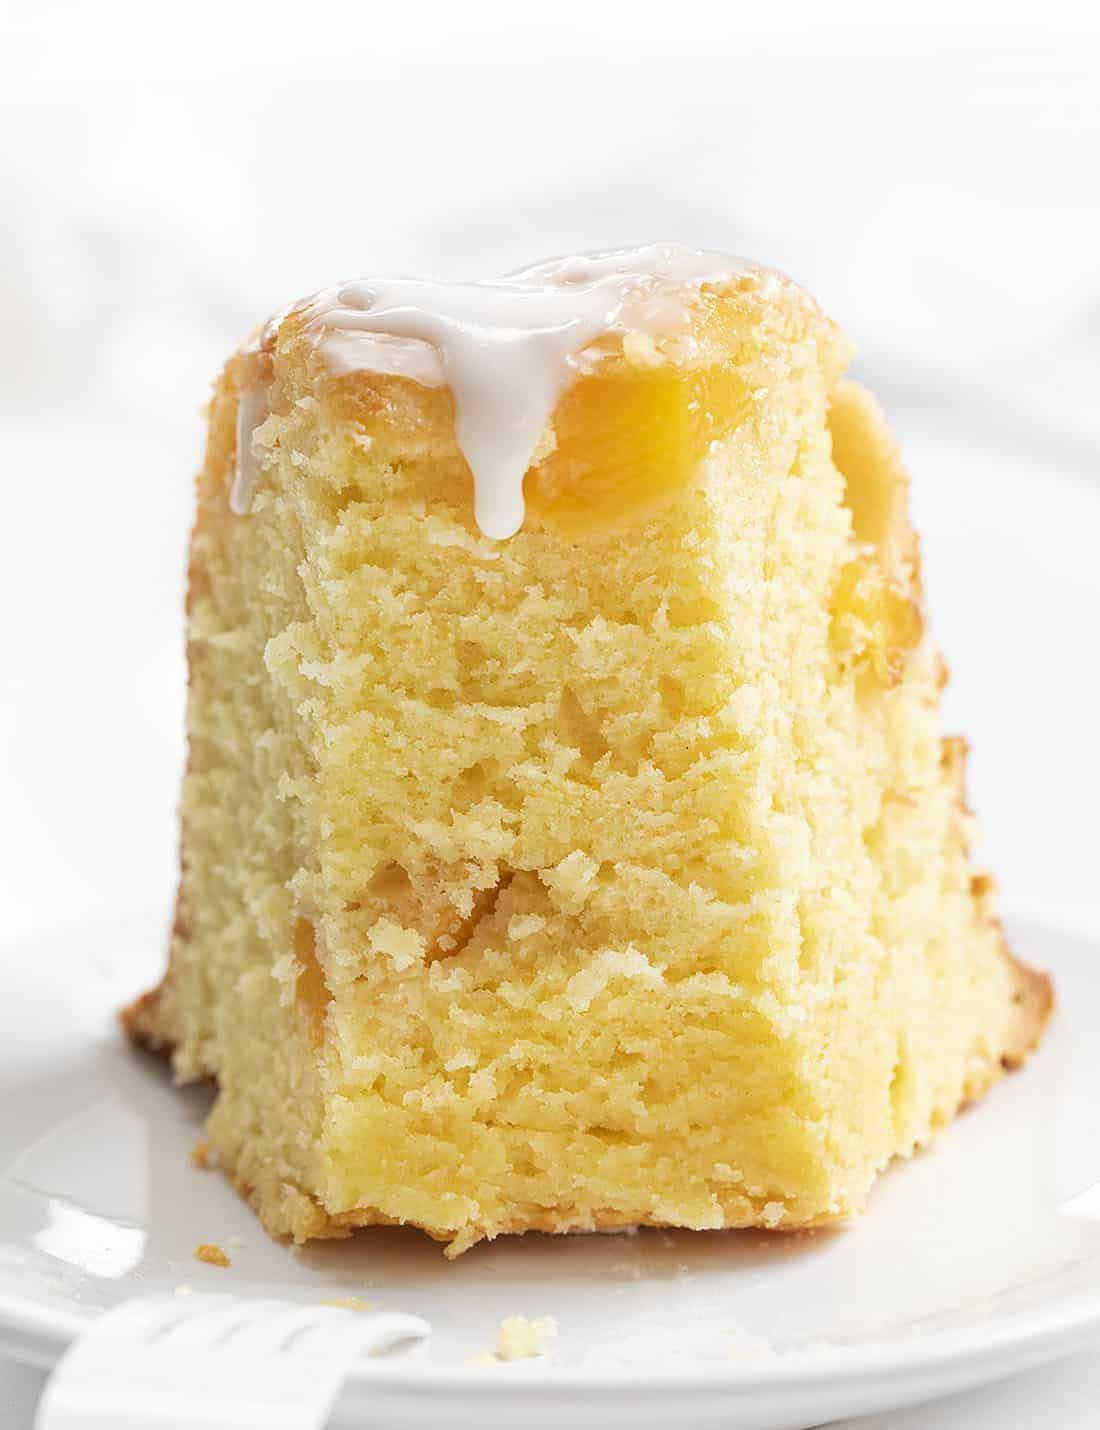 Slice of Peach Pound Cake with Vanilla Glaze on White Plate